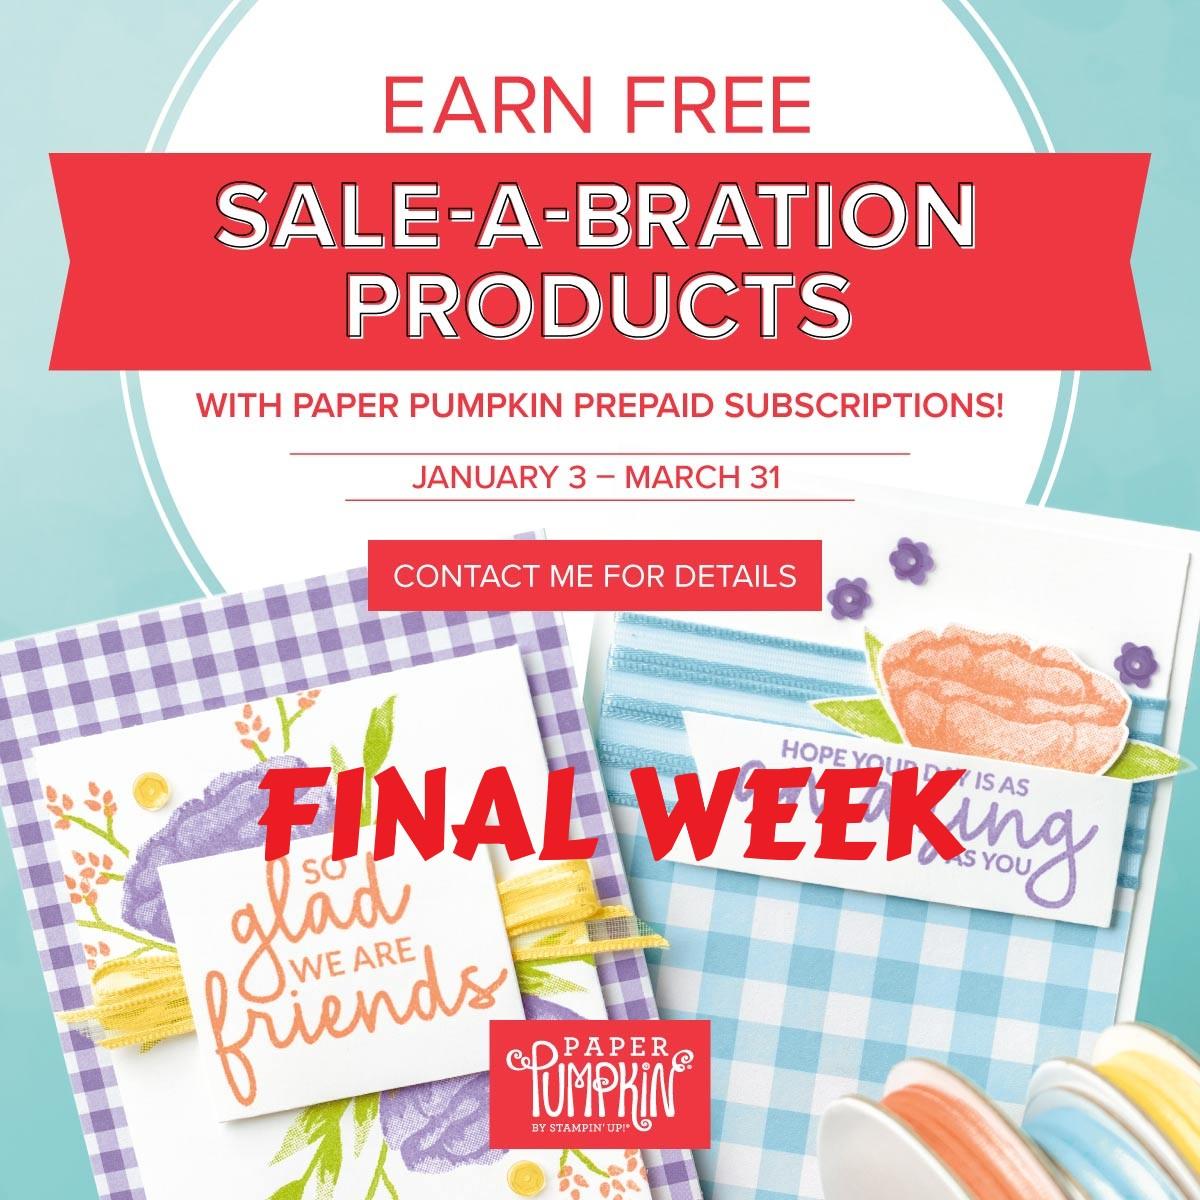 Marvelous Possibilities: Final week of SaleABration  Don't